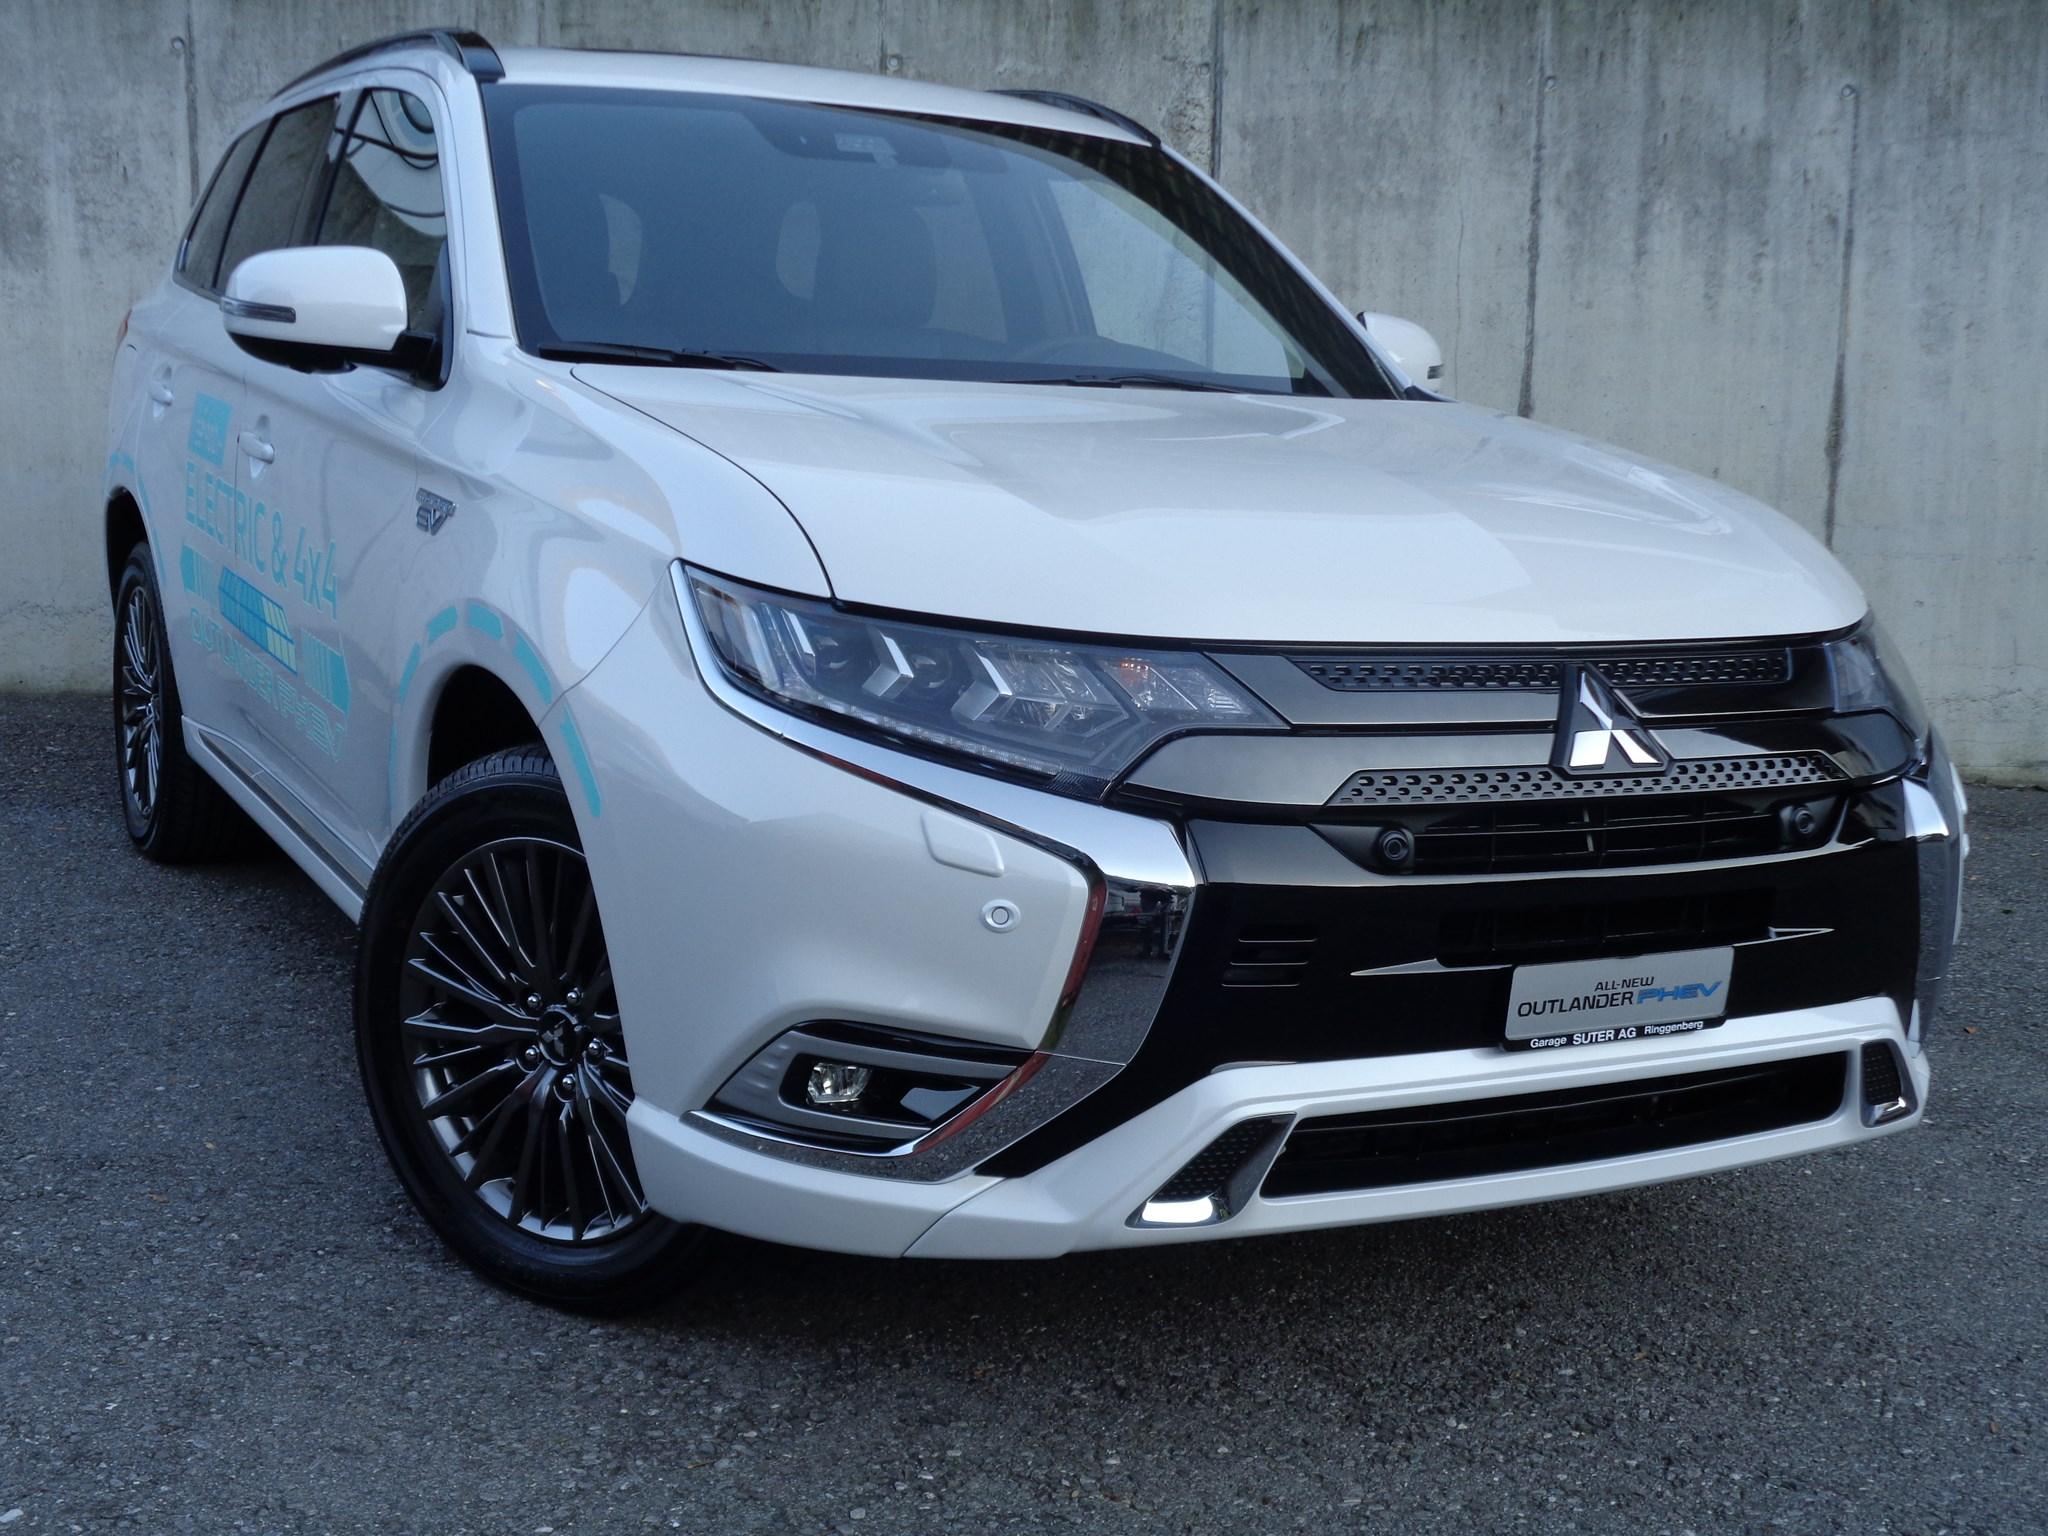 suv Mitsubishi Outlander 2.0 PHEV Diamond S-Edition 4WD Automatic